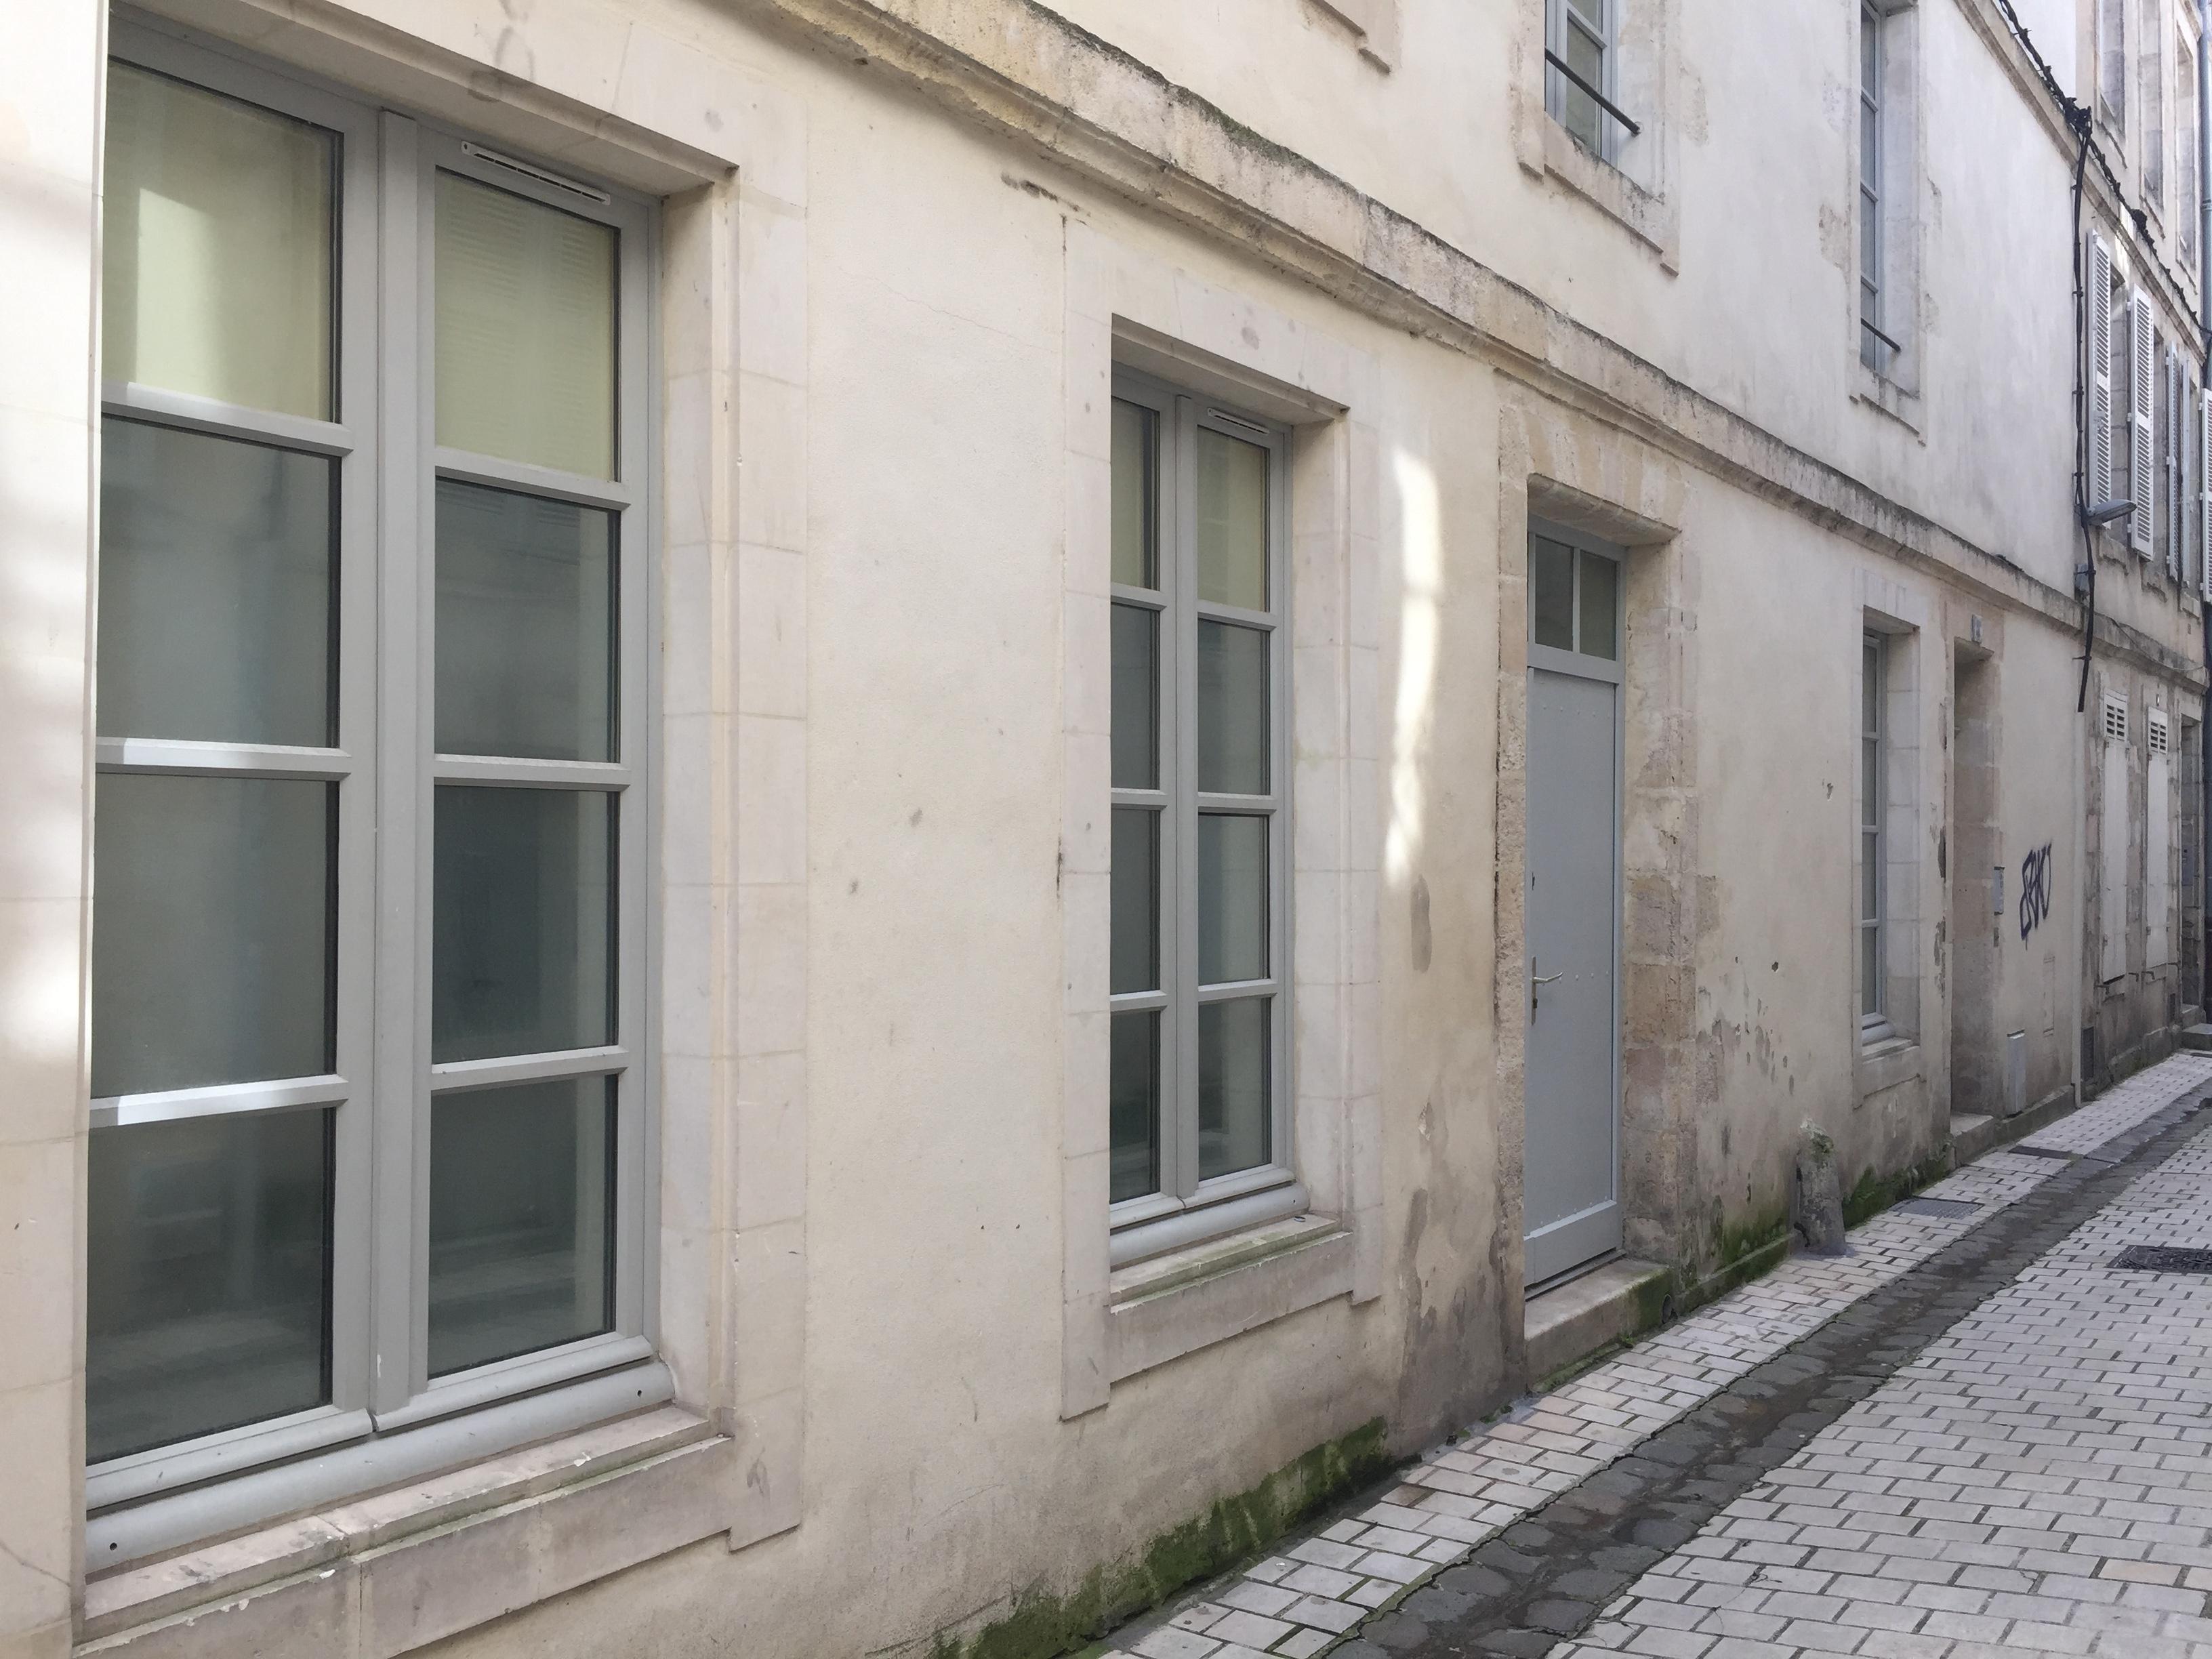 À vendre à La Rochelle, HYPER CENTRE, PROCHE DE LA MER